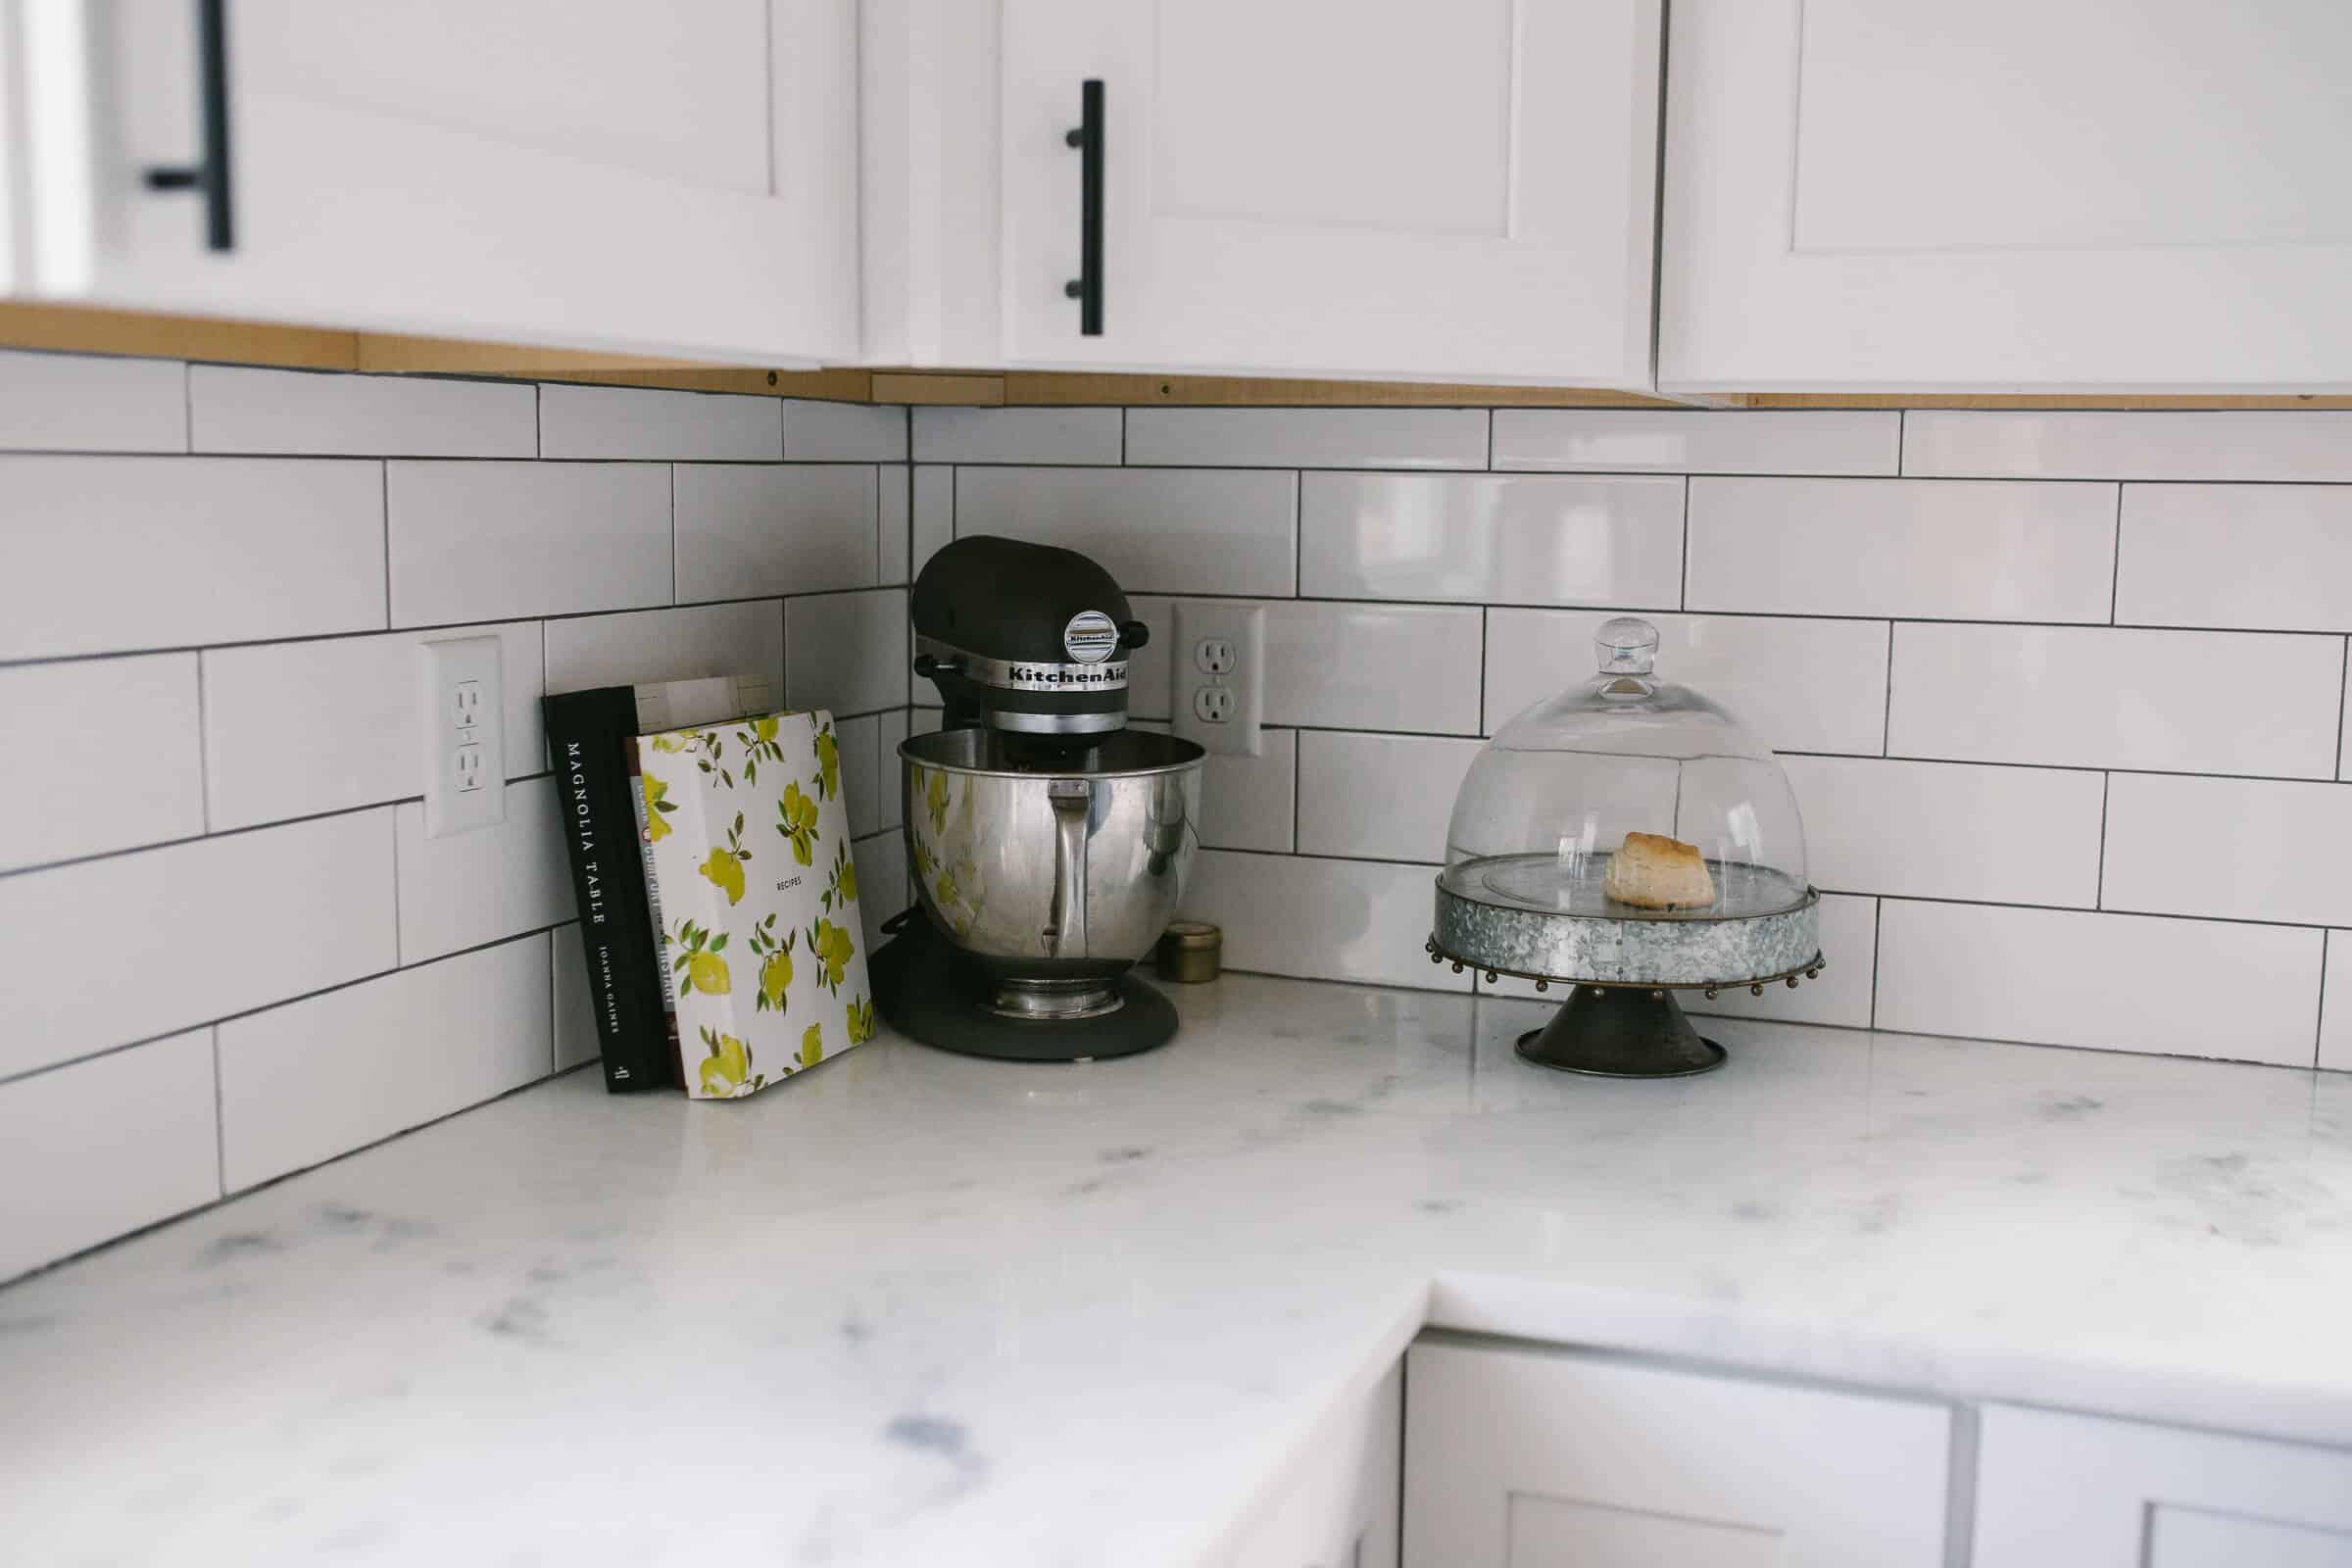 white kitchen cabinets in a modern white kitchen with kitchenaid mixer